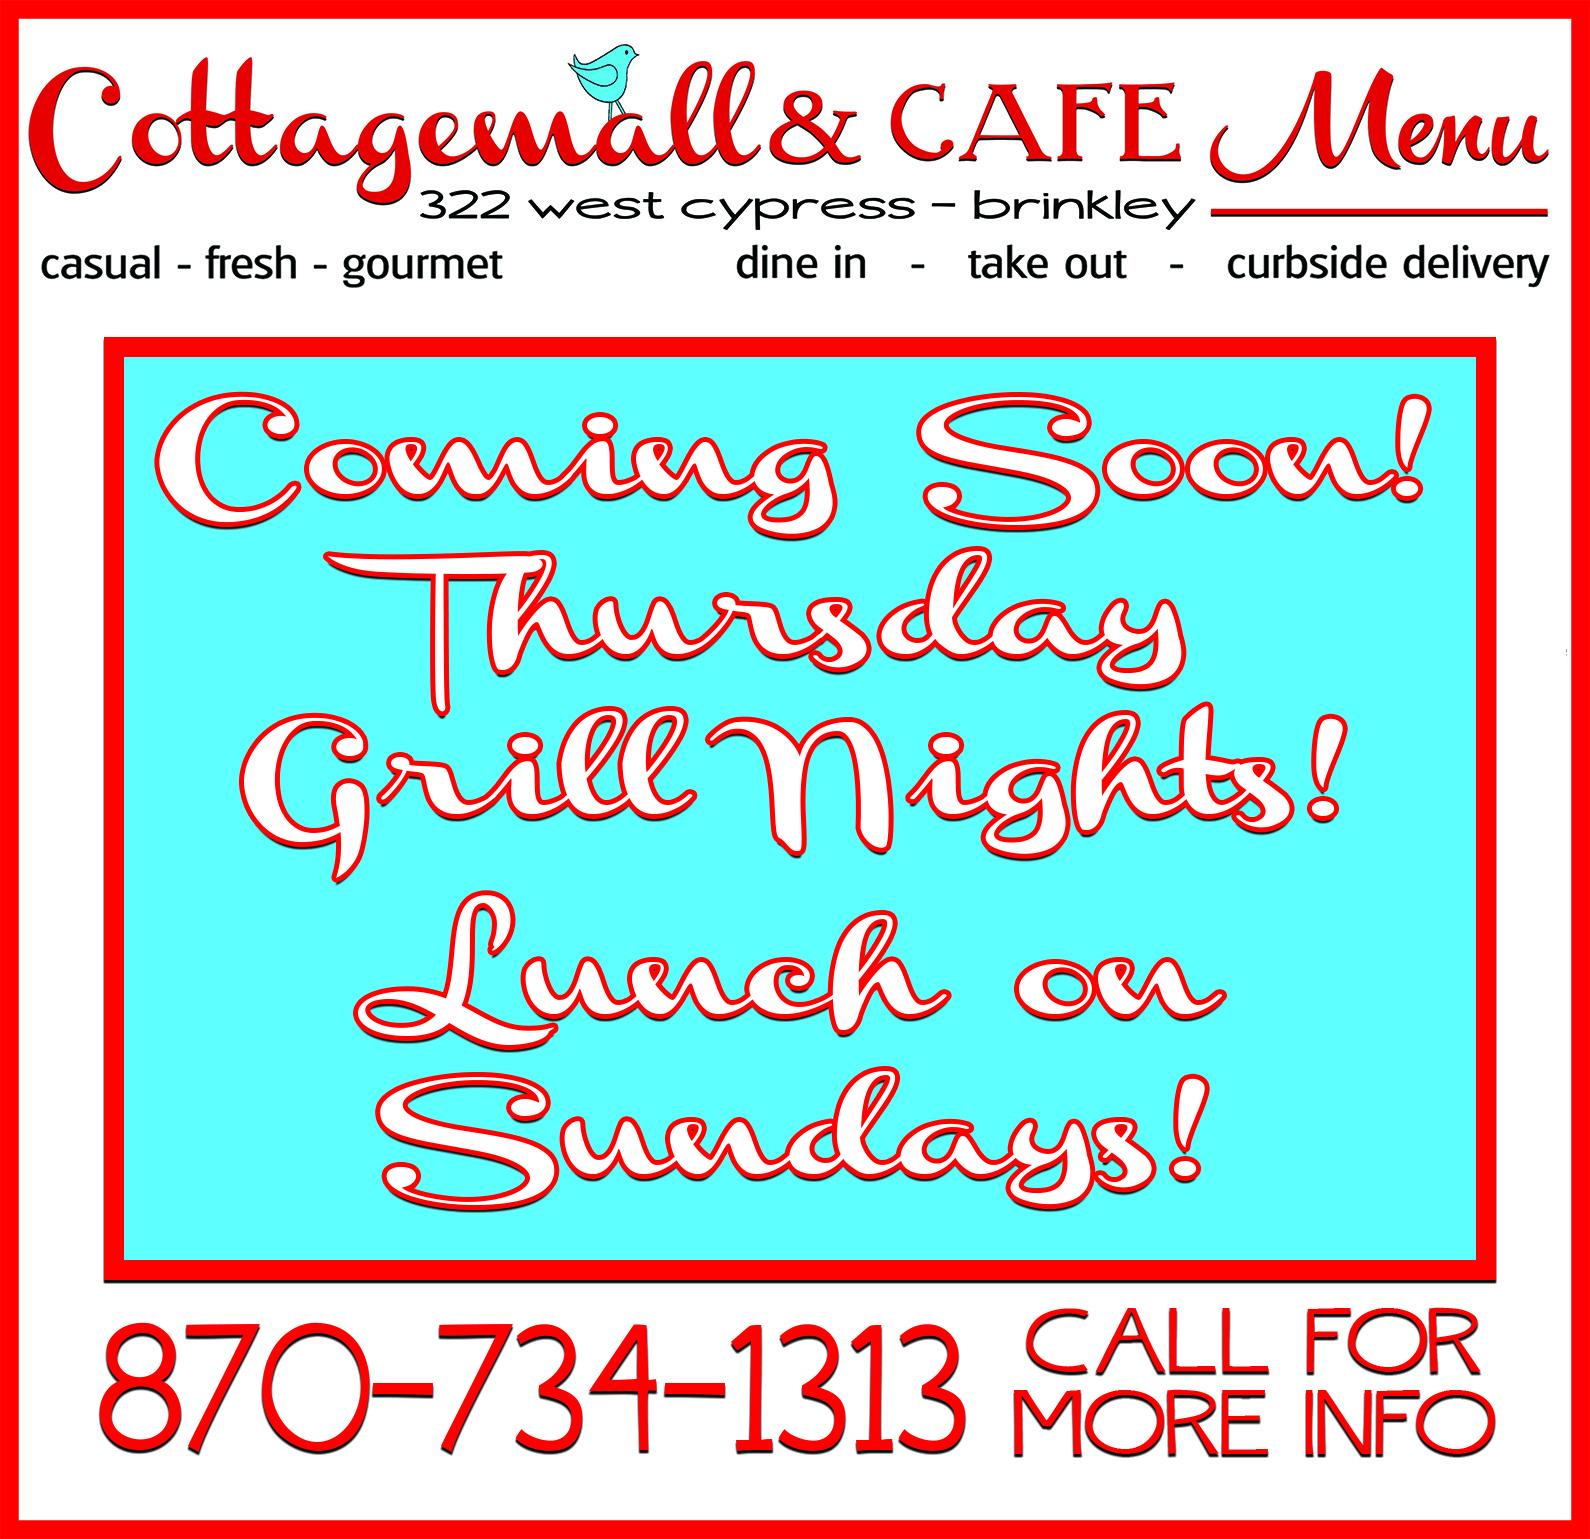 Cottagemall menu ad 11.27.2020